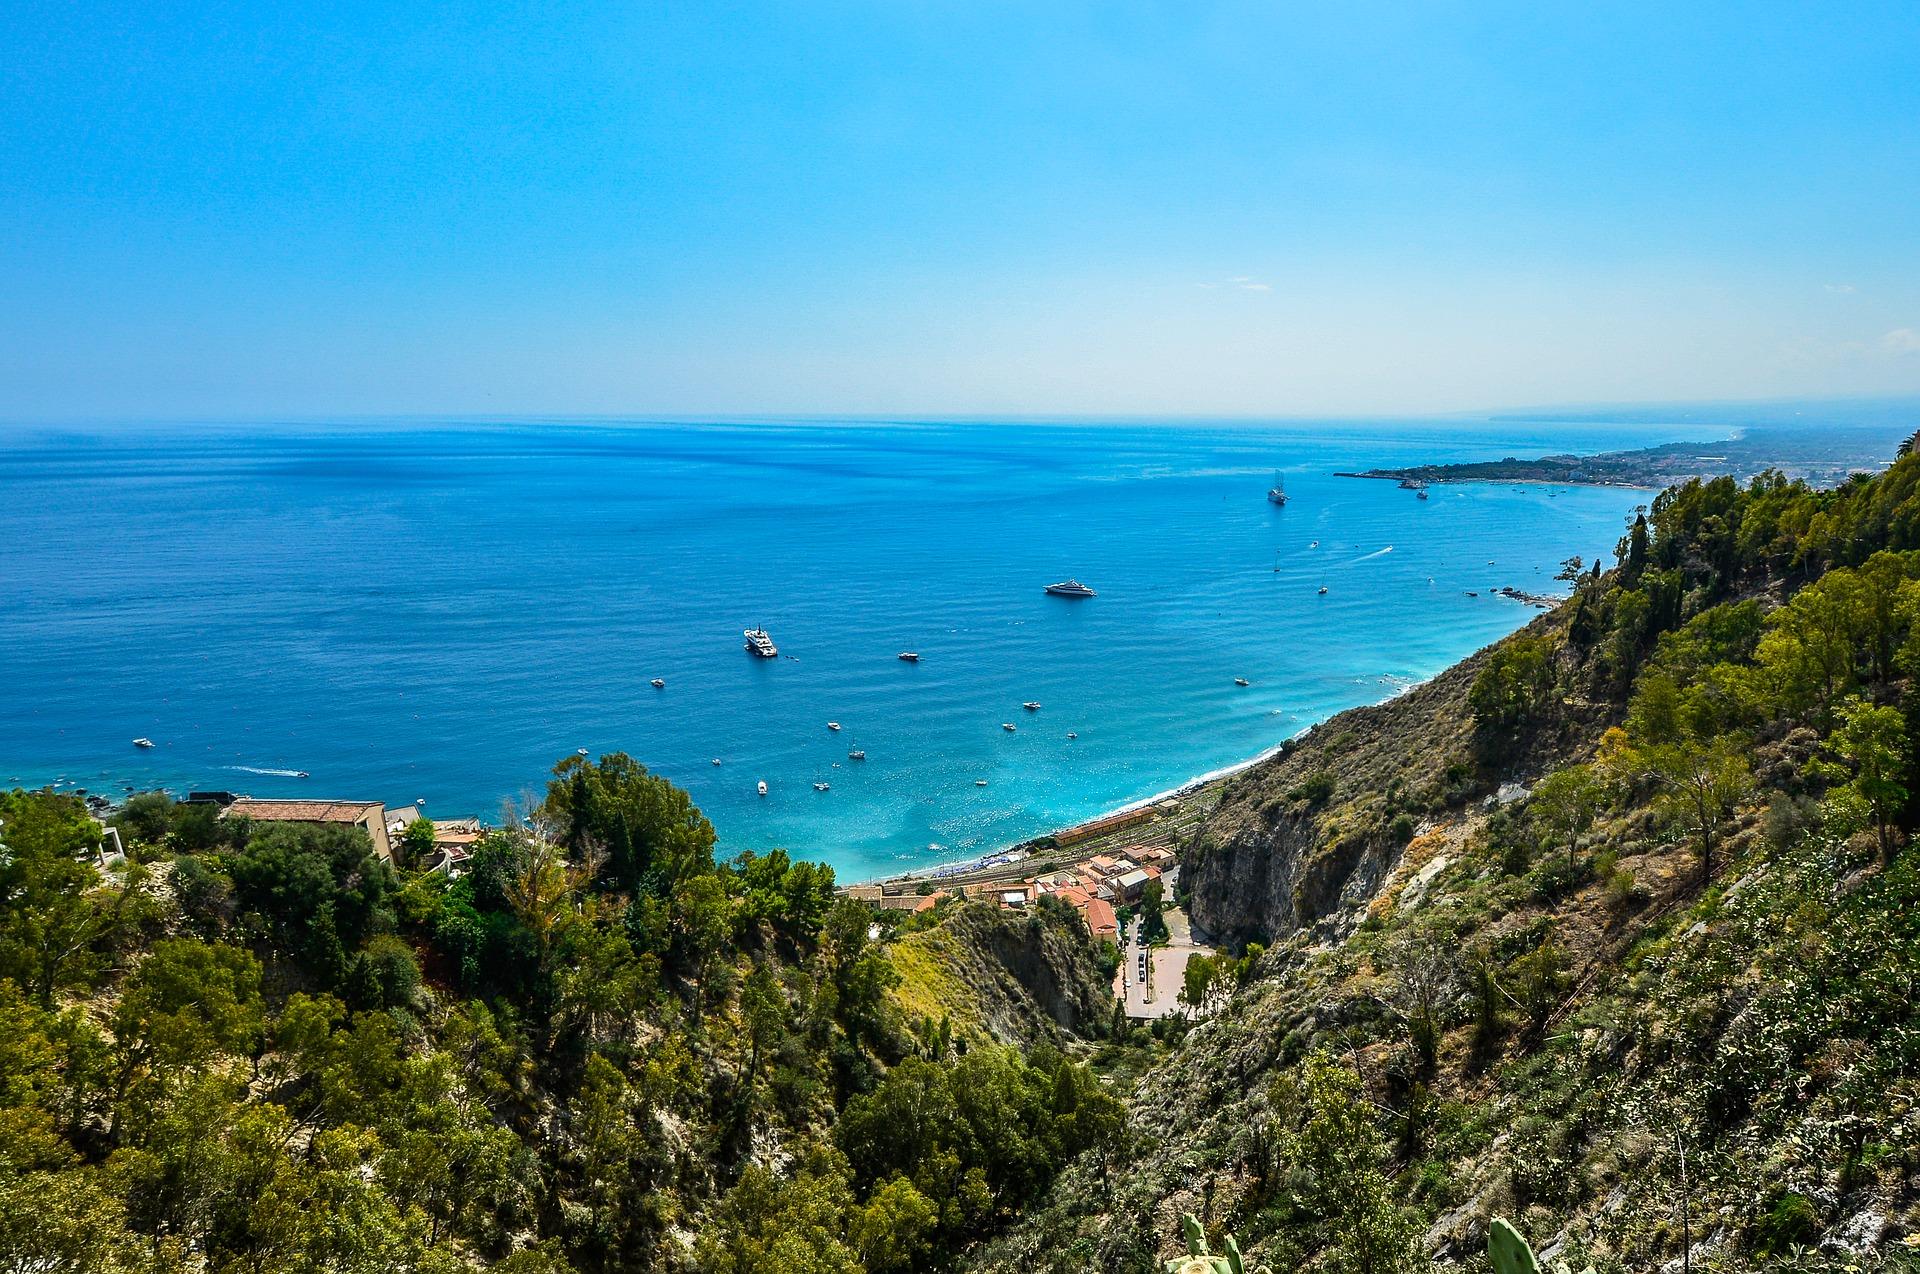 Flug nach Sizilien ab 5,99€ - Hotel ab 16,09€ die Nacht pro Person